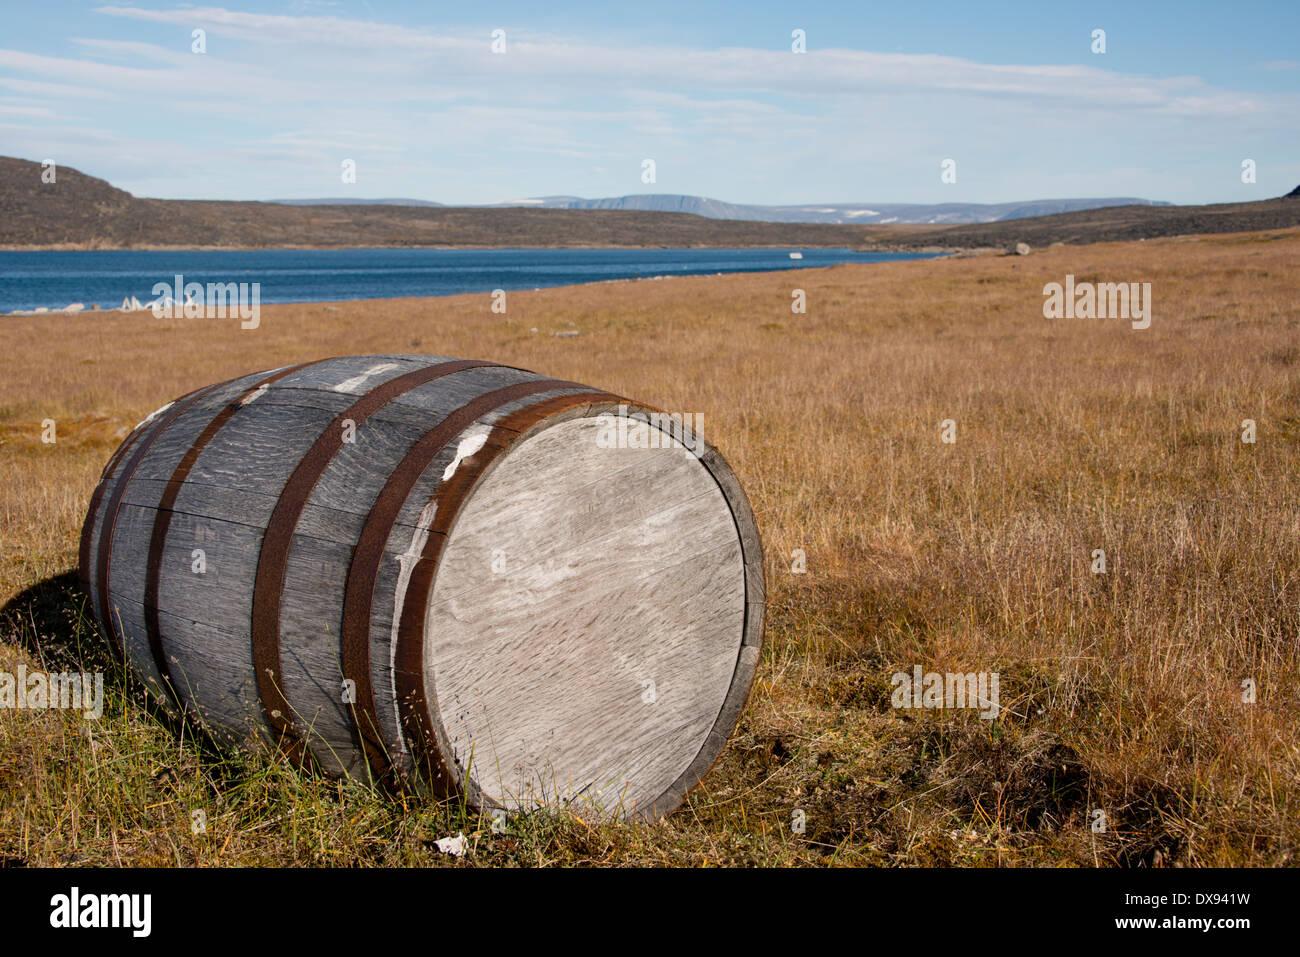 Canada, Nunavut, Qikiqtaaluk Region, Kekerten Island off the coast of Baffin Island. - Stock Image